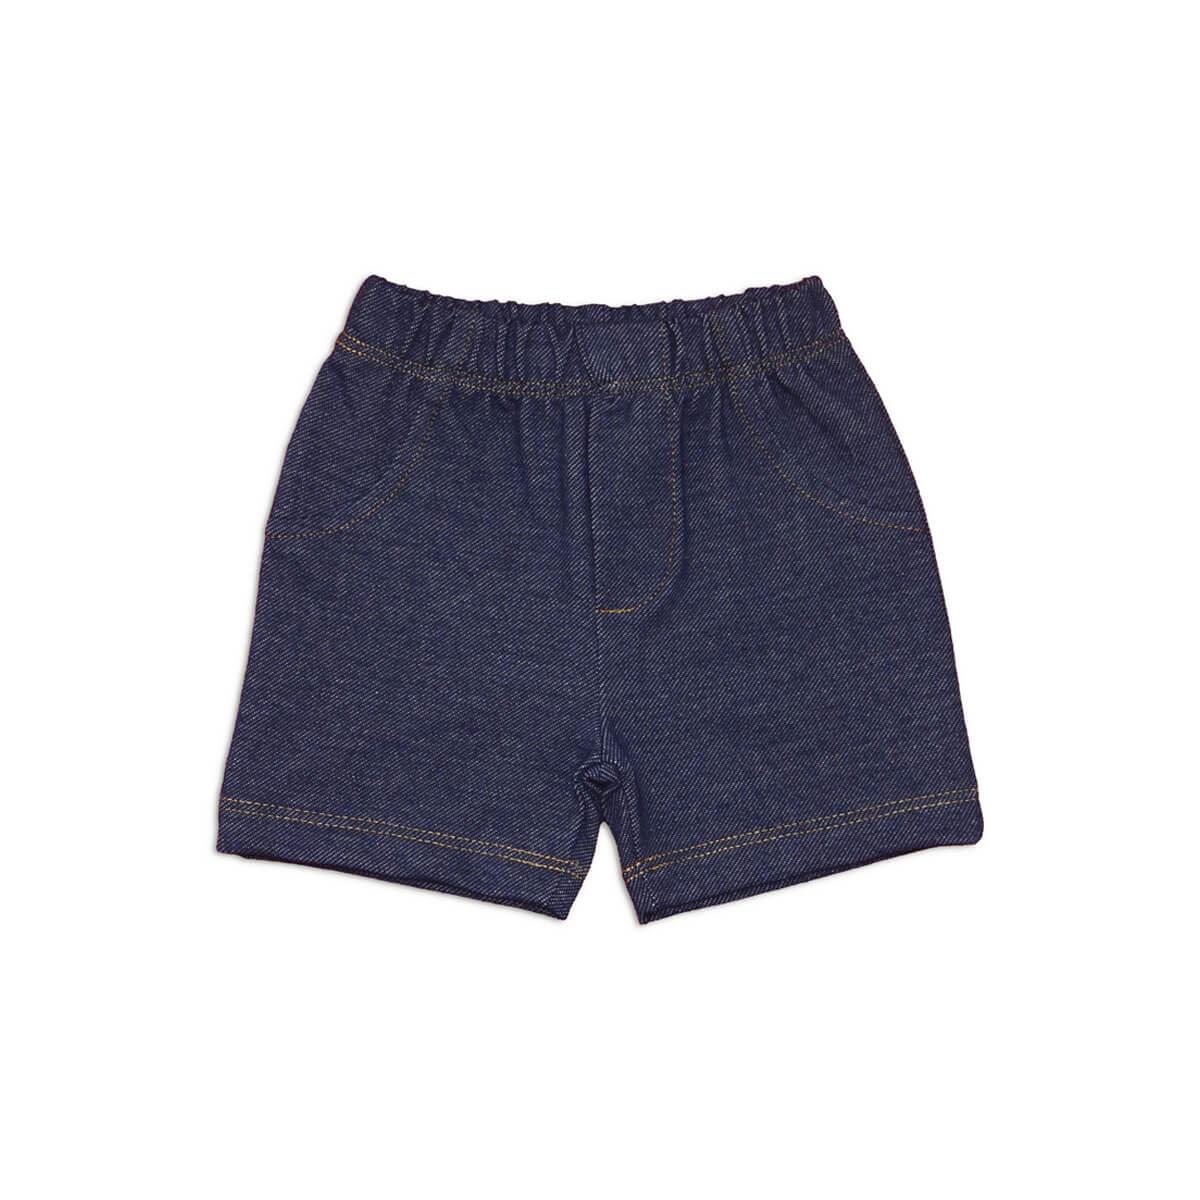 Shorts Masculino Estilo Jeans Moletinho